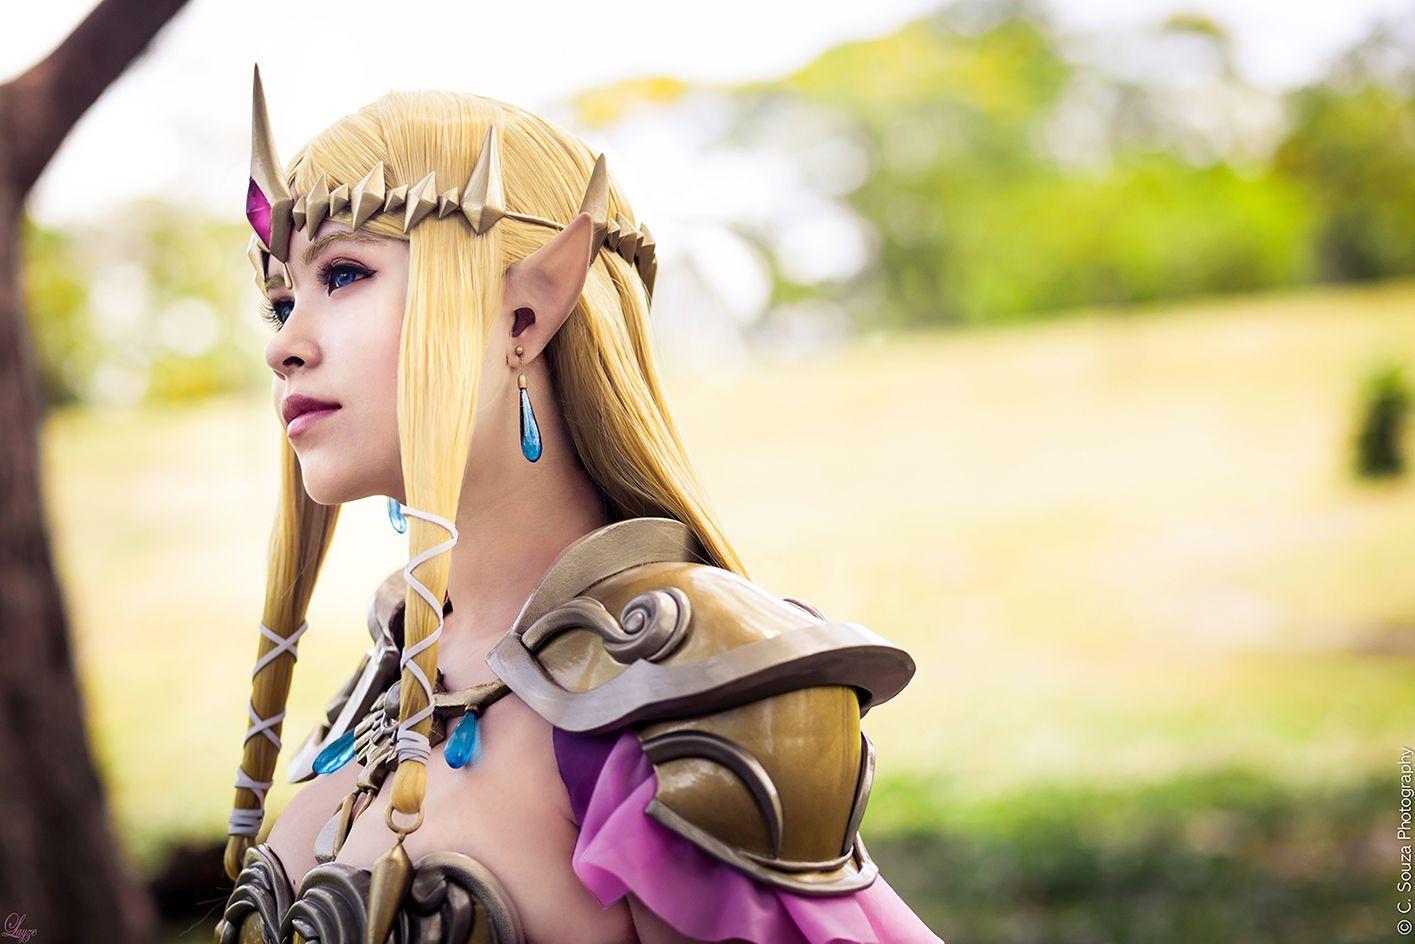 Queen zelda from hyrule warriors by layzemichelle deviantart com on deviantart